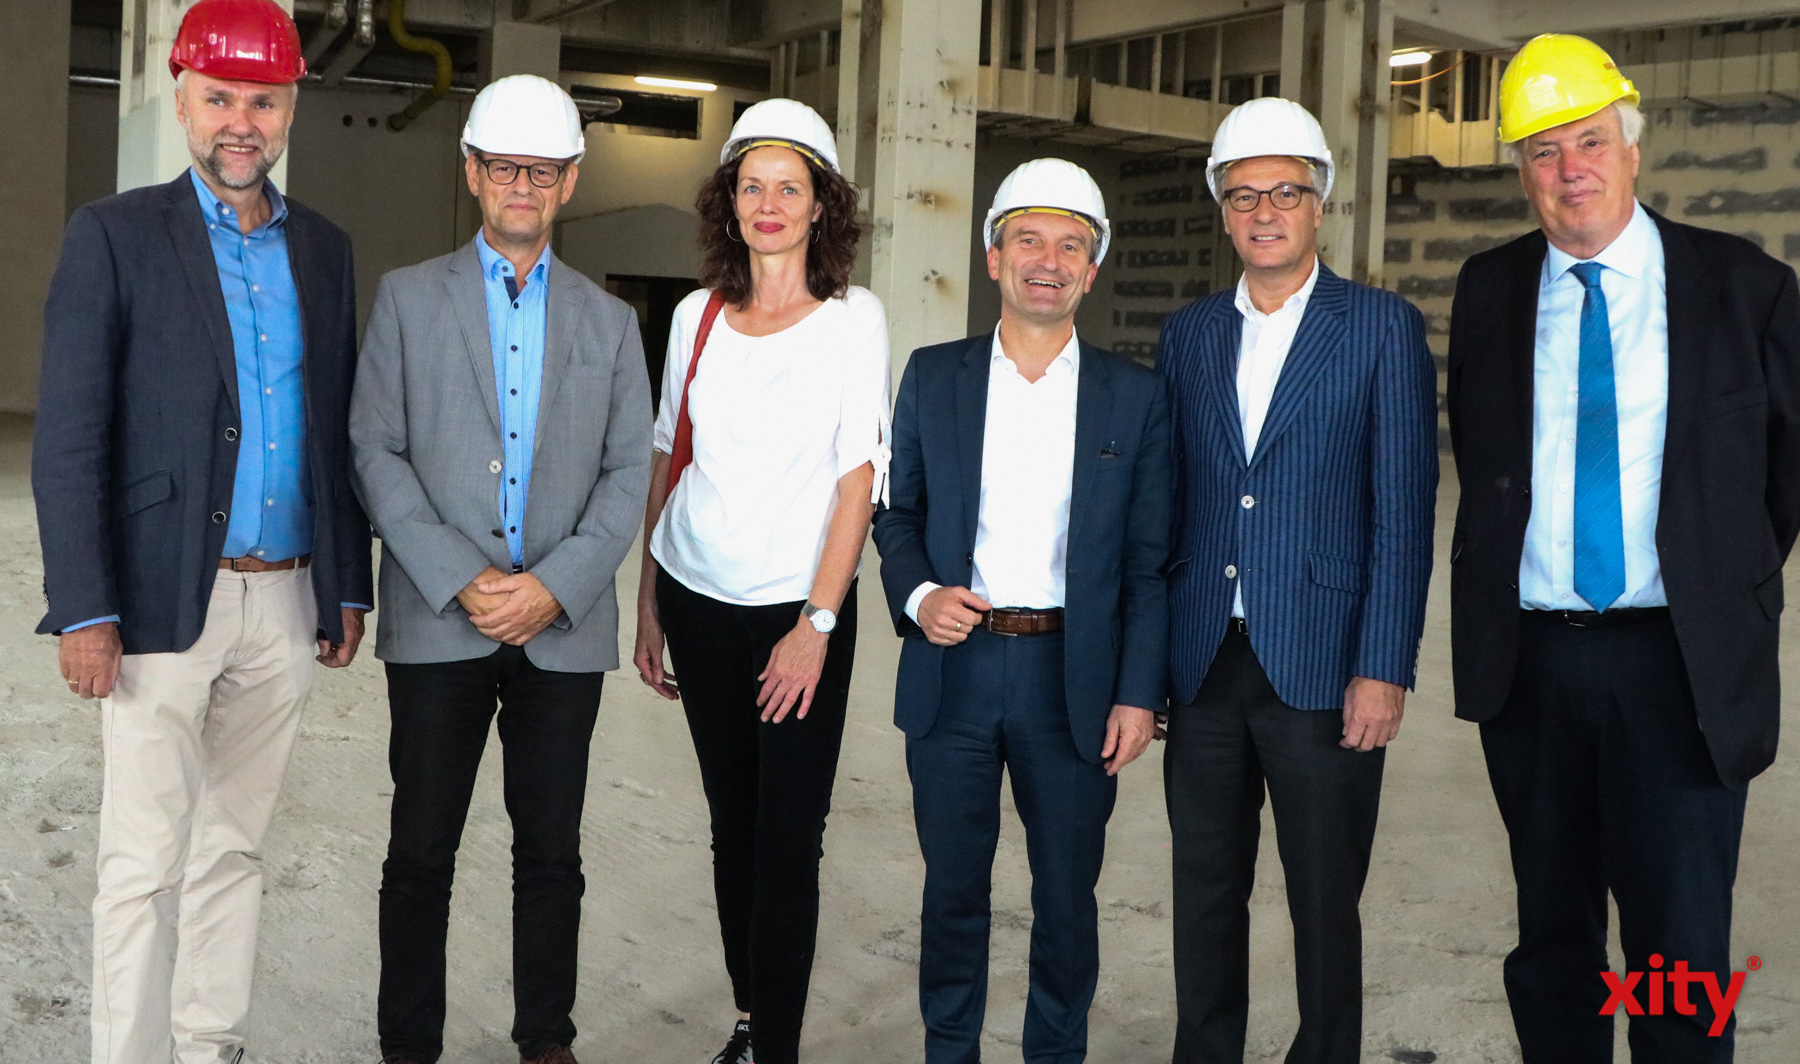 Oberbürgermeister Thomas Geisel, Katrin Tiedemann, Kulturdezernent Hans-Georg Lohe, Dr. Norbert Kamp, Dirck Smolka, Olav Janssen. (Foto: xity)